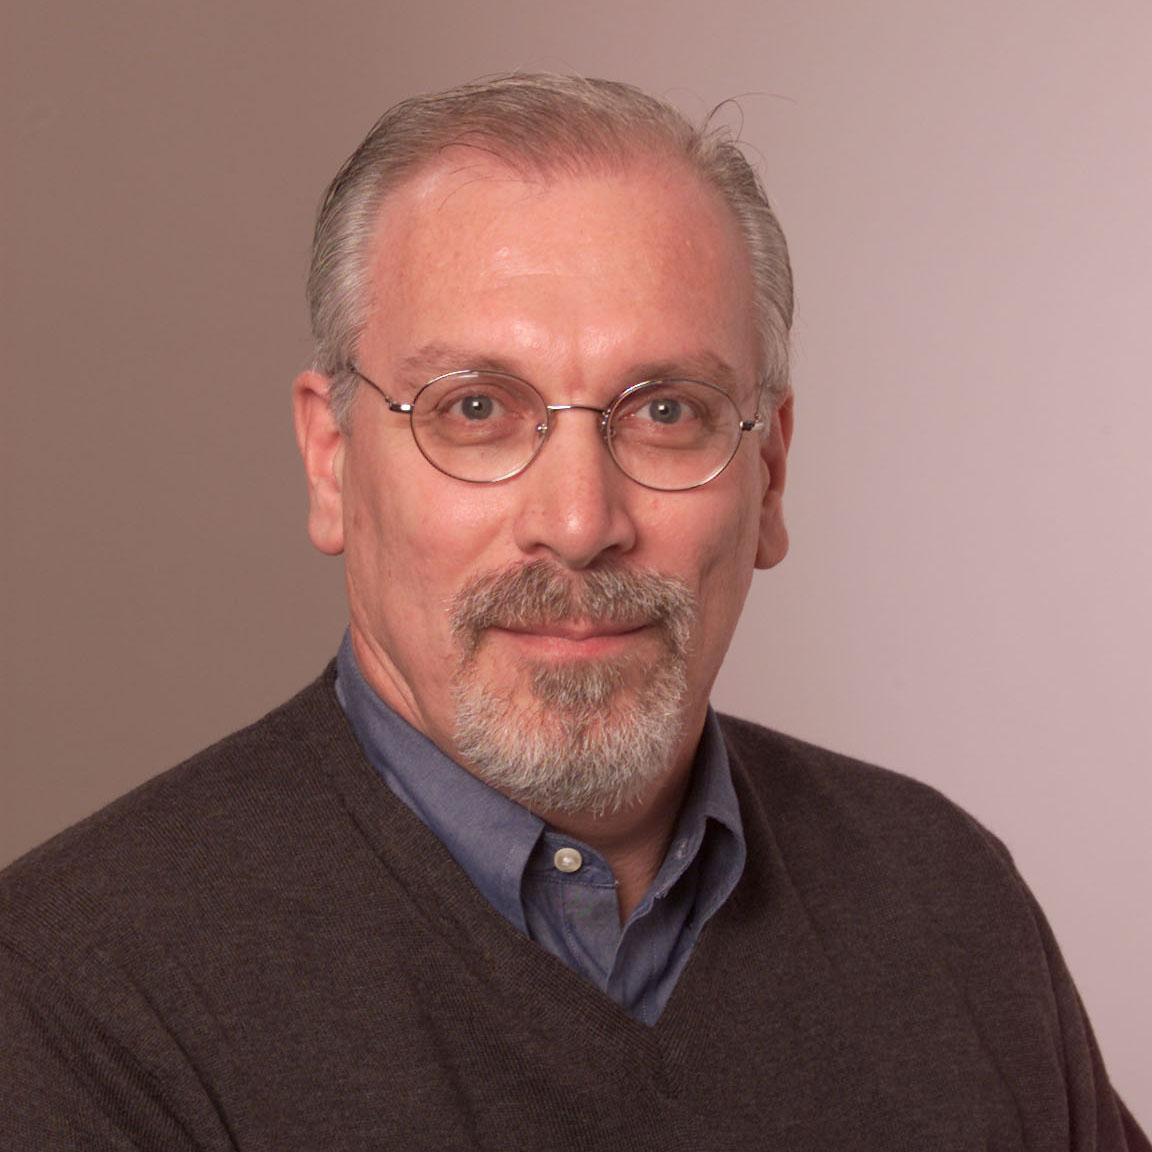 Richard DeMillo